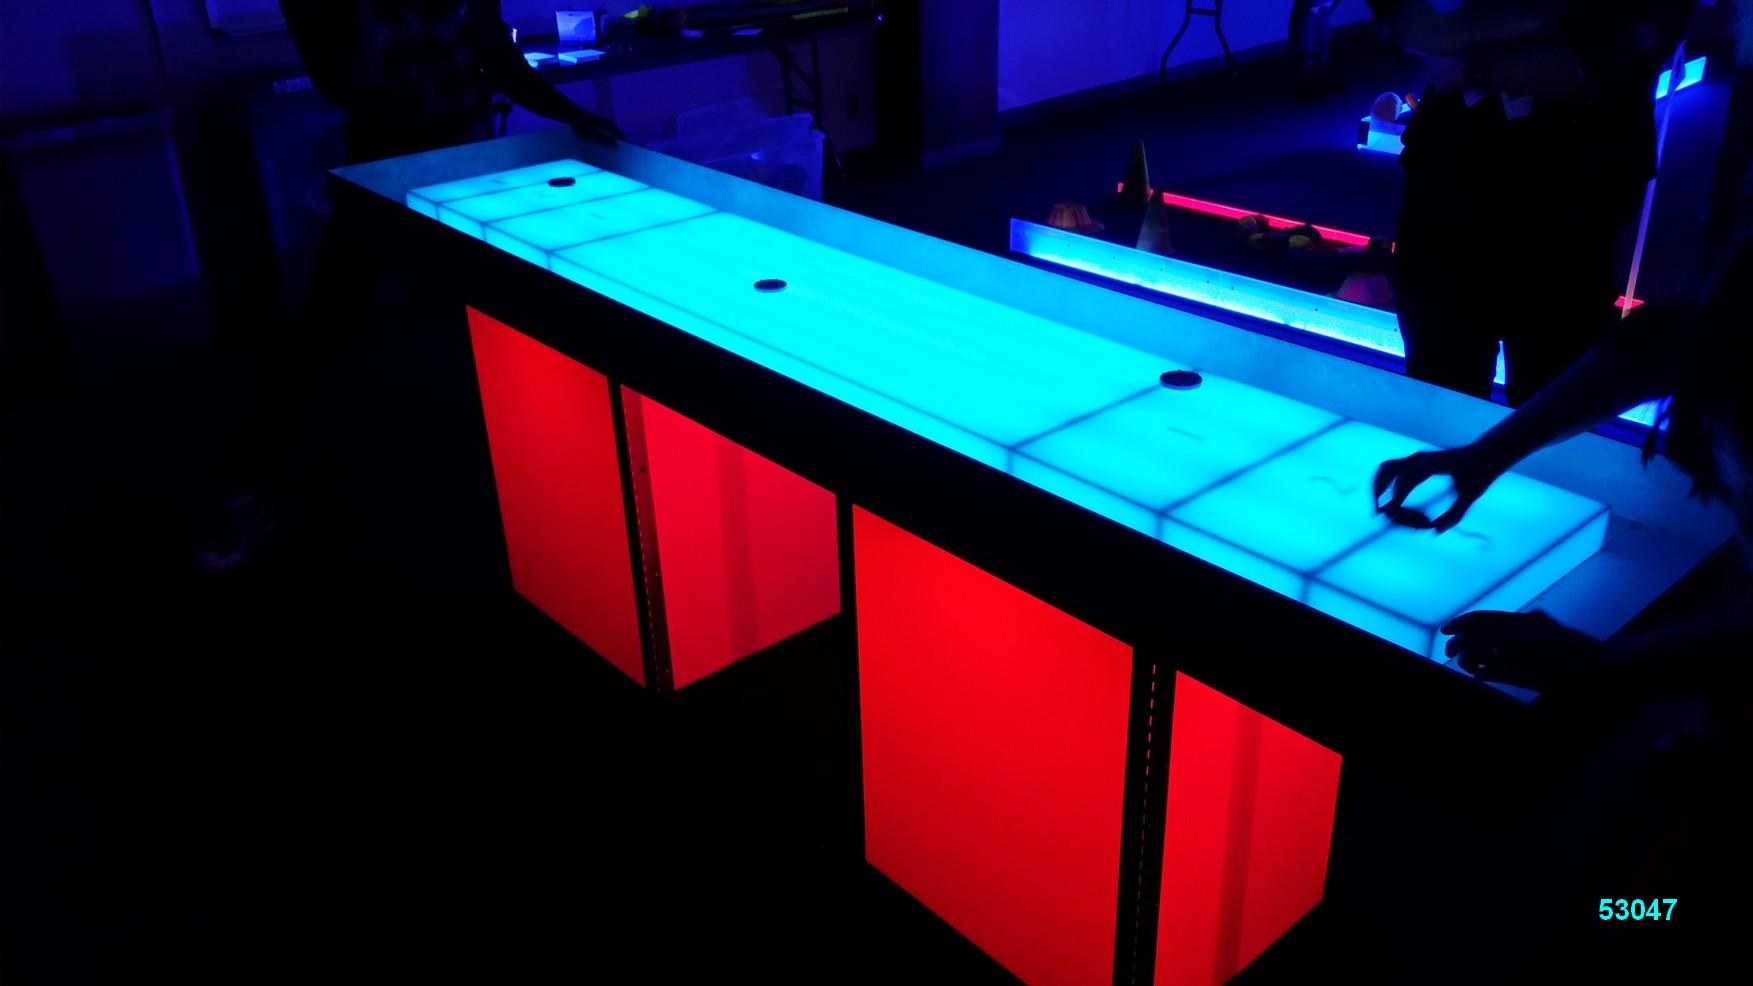 glow games shuffleboard red glow in the dark rentals 53047